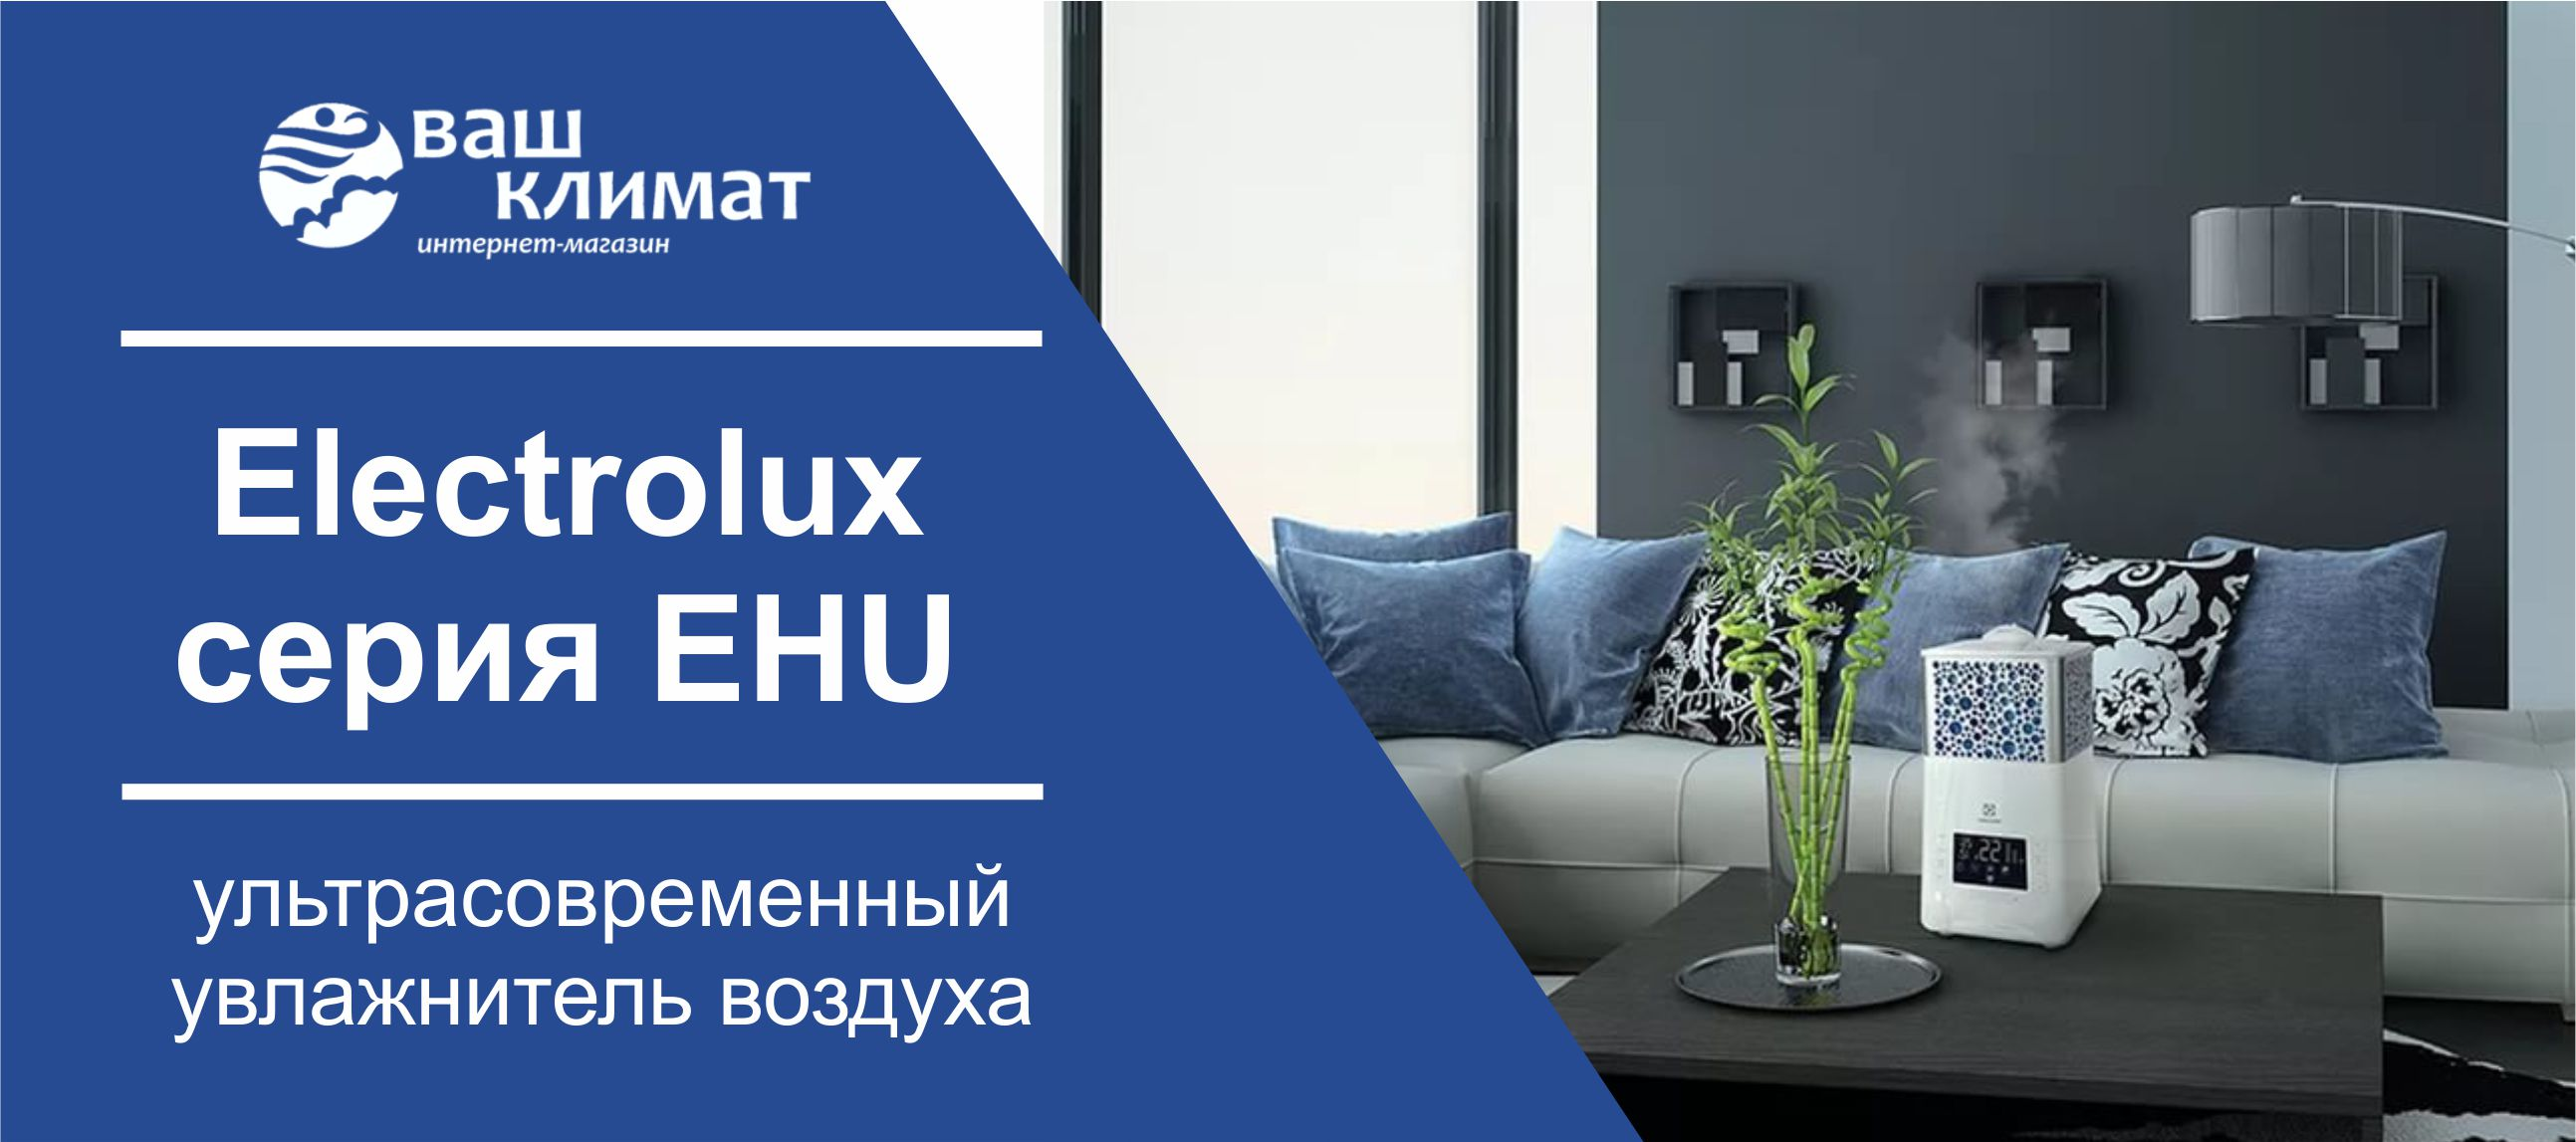 Banner-ElectroluxEHU